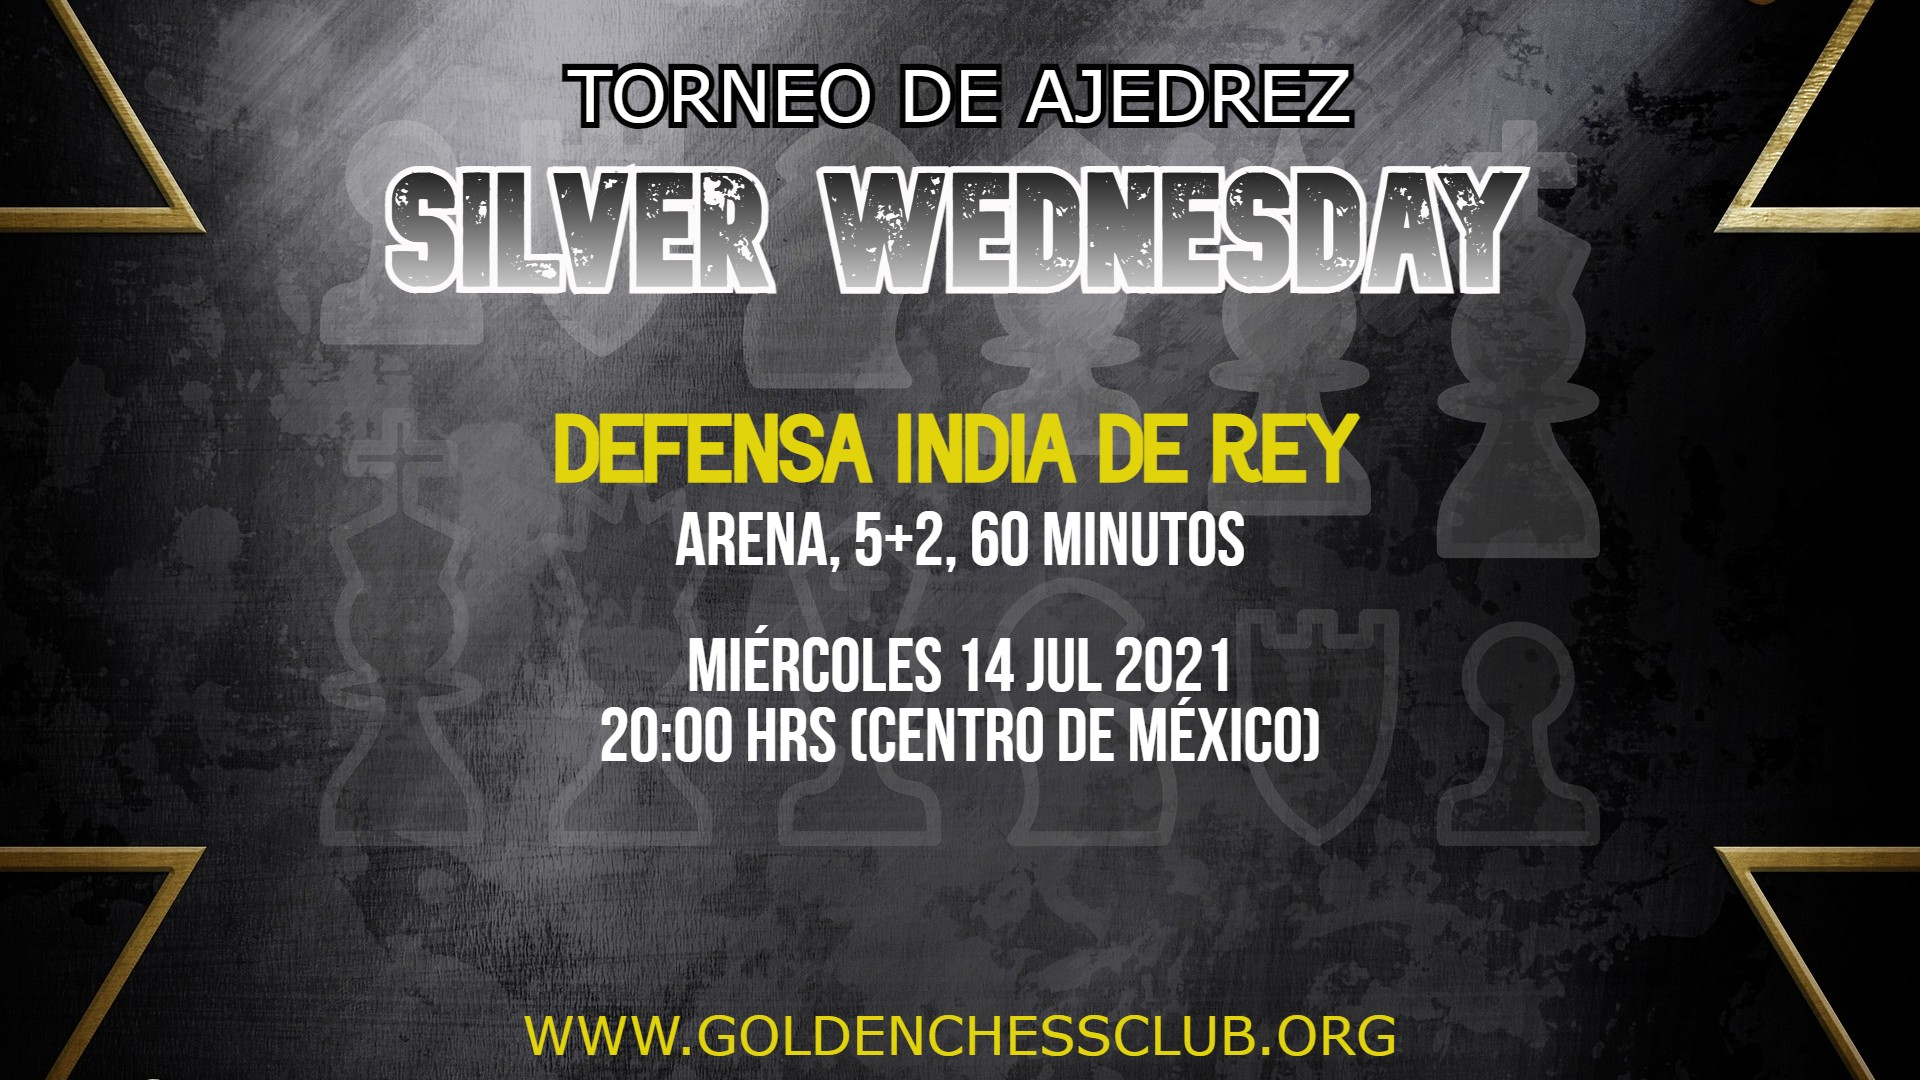 TORNEO DE AJEDREZ SILVER WEDNESDAY INDIA DE REY ARENA 140721